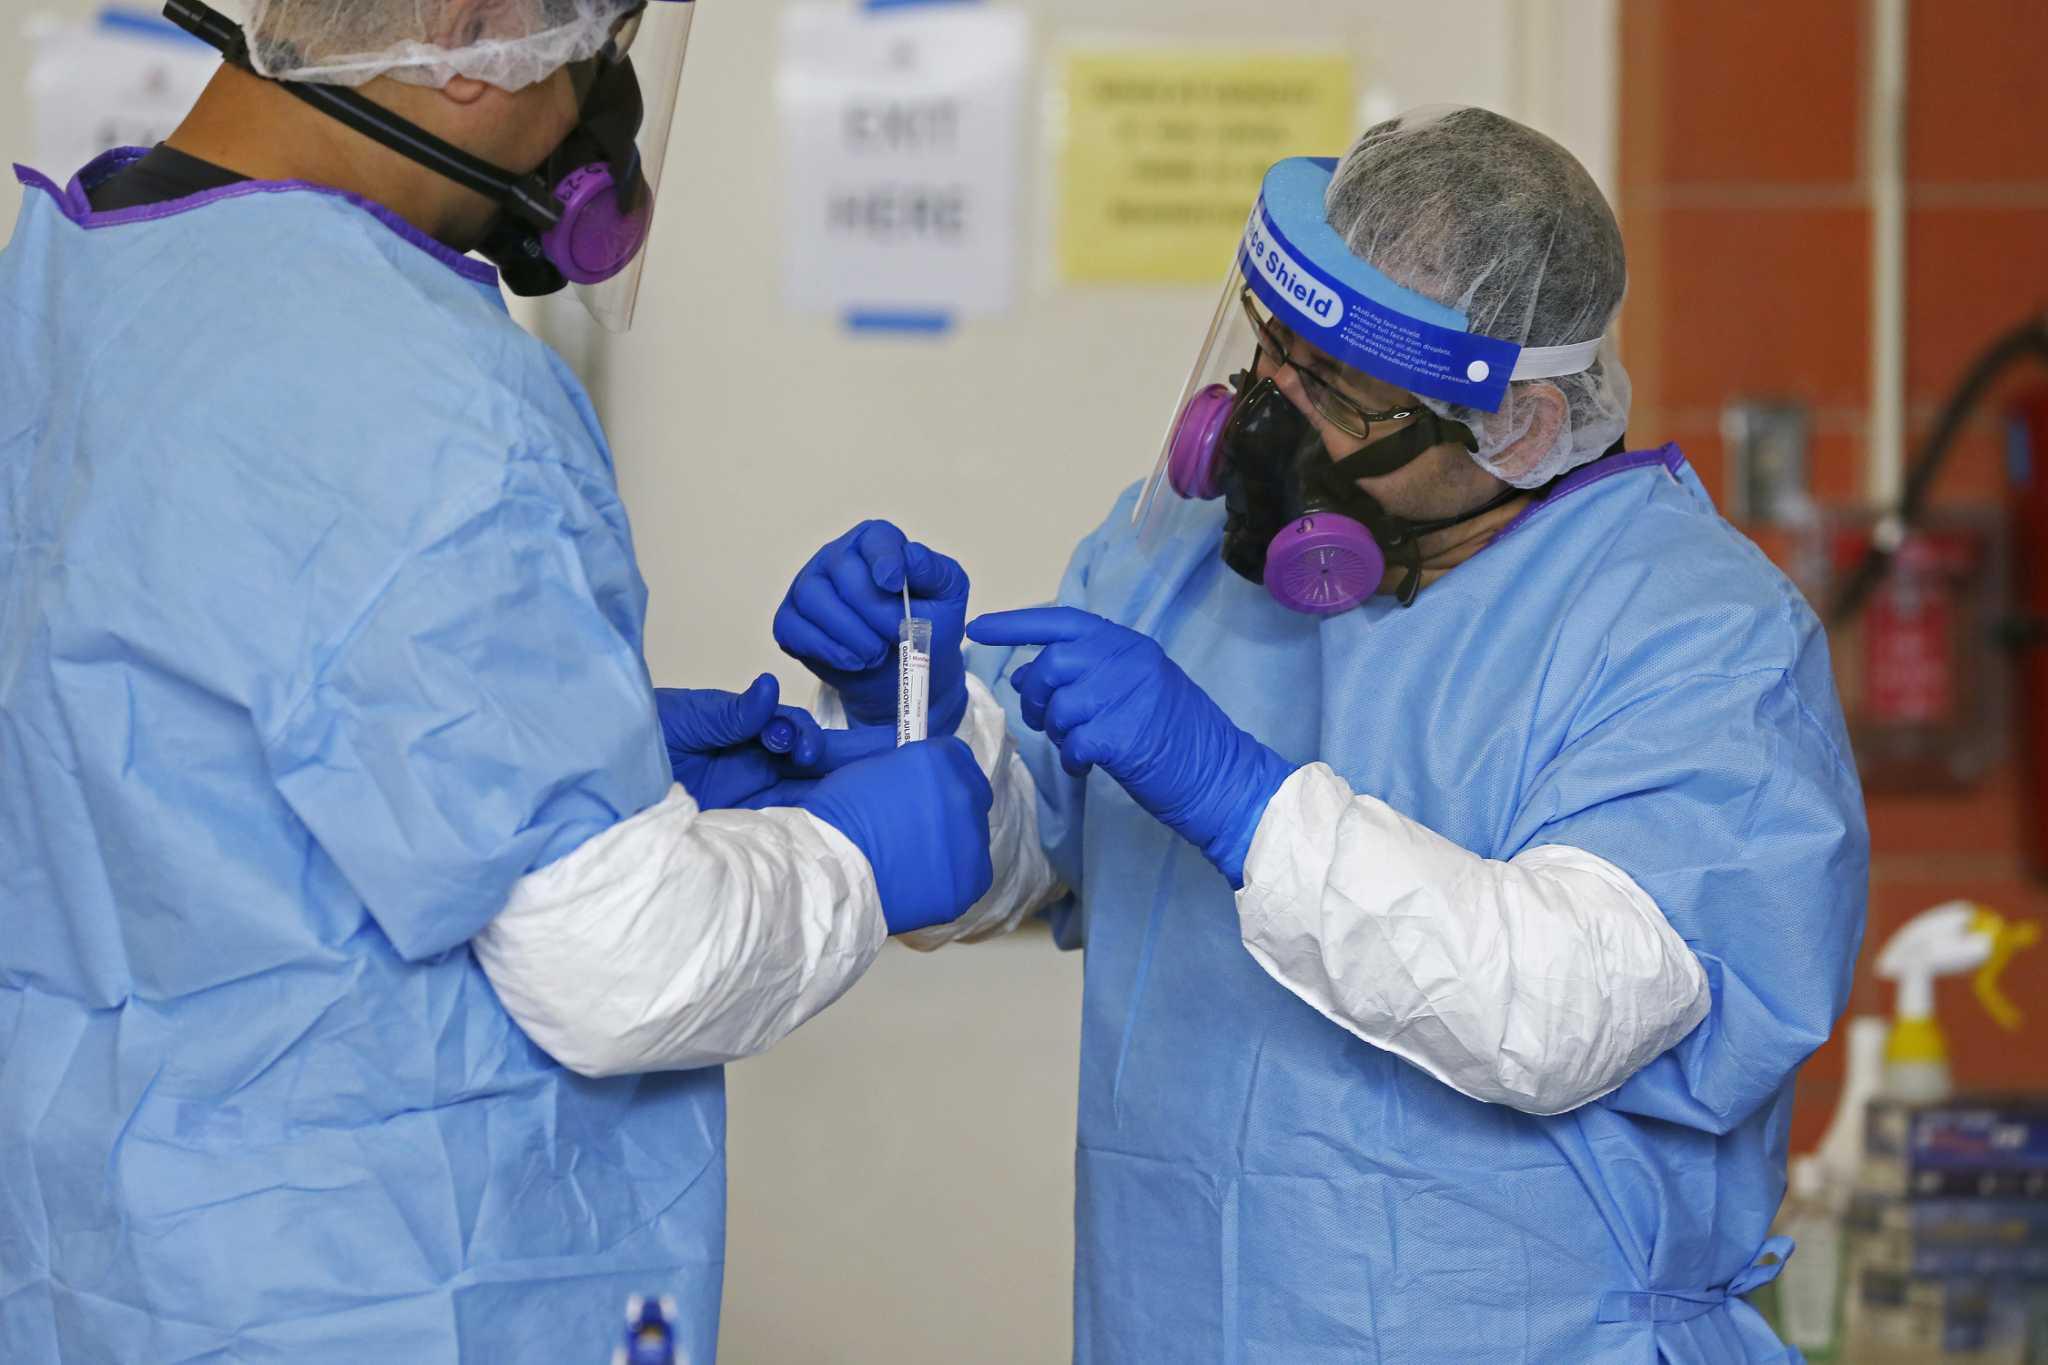 City run virus testing websites in San Antonio will now solely check symptomatic individuals - mySA thumbnail